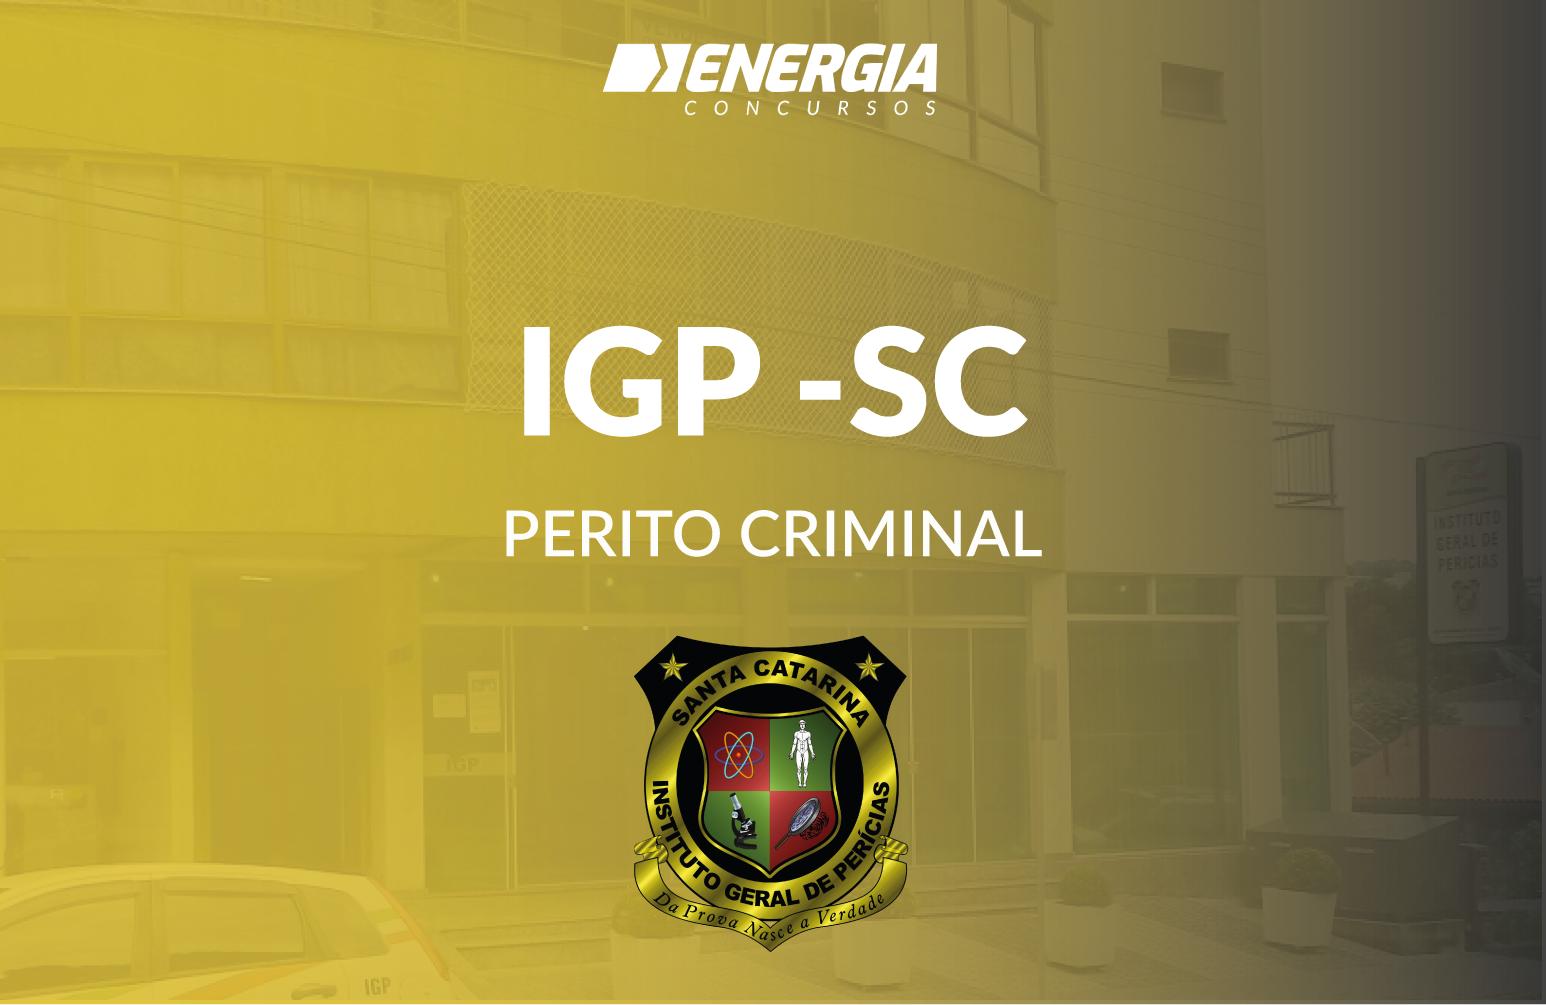 IGP SC - Perito Criminal (Área Criminal Geral)